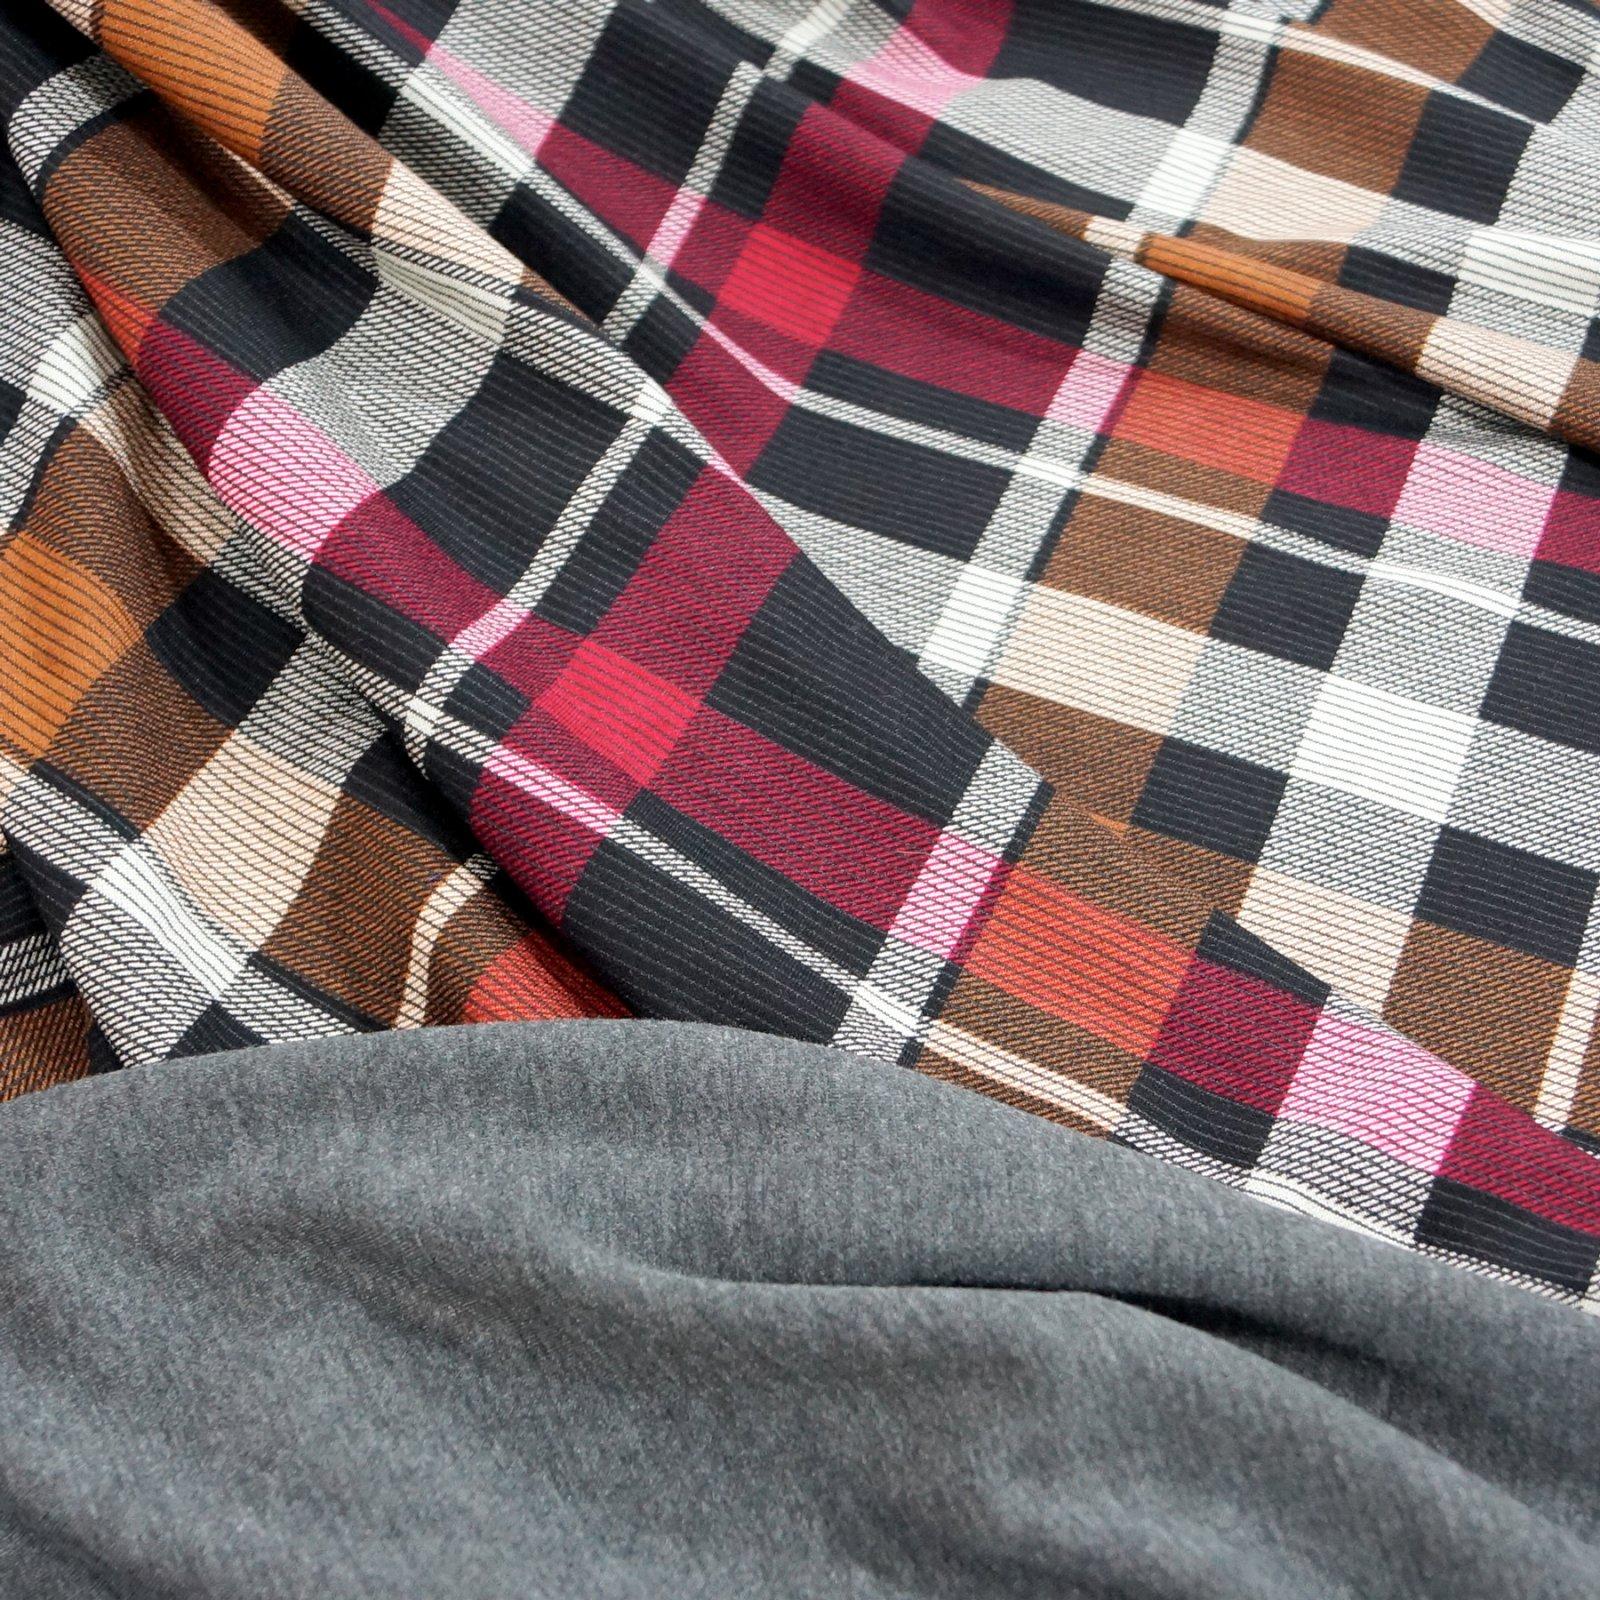 Rayon Double Knit - Crimson & Caramel Plaid